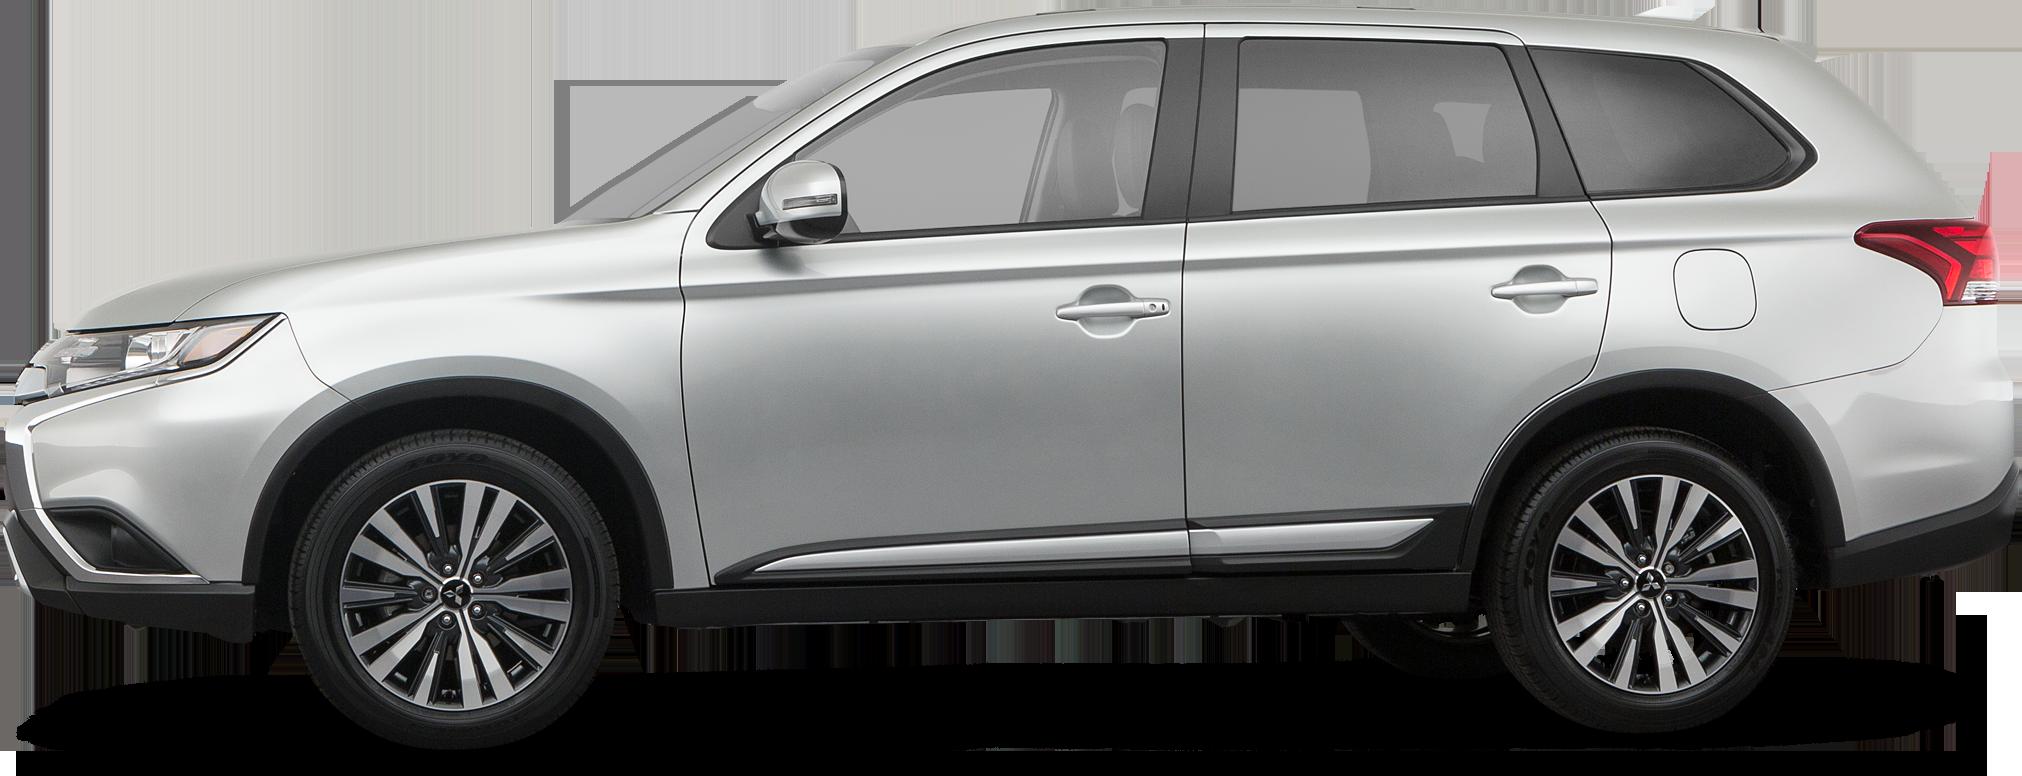 2020 Mitsubishi Outlander CUV SE